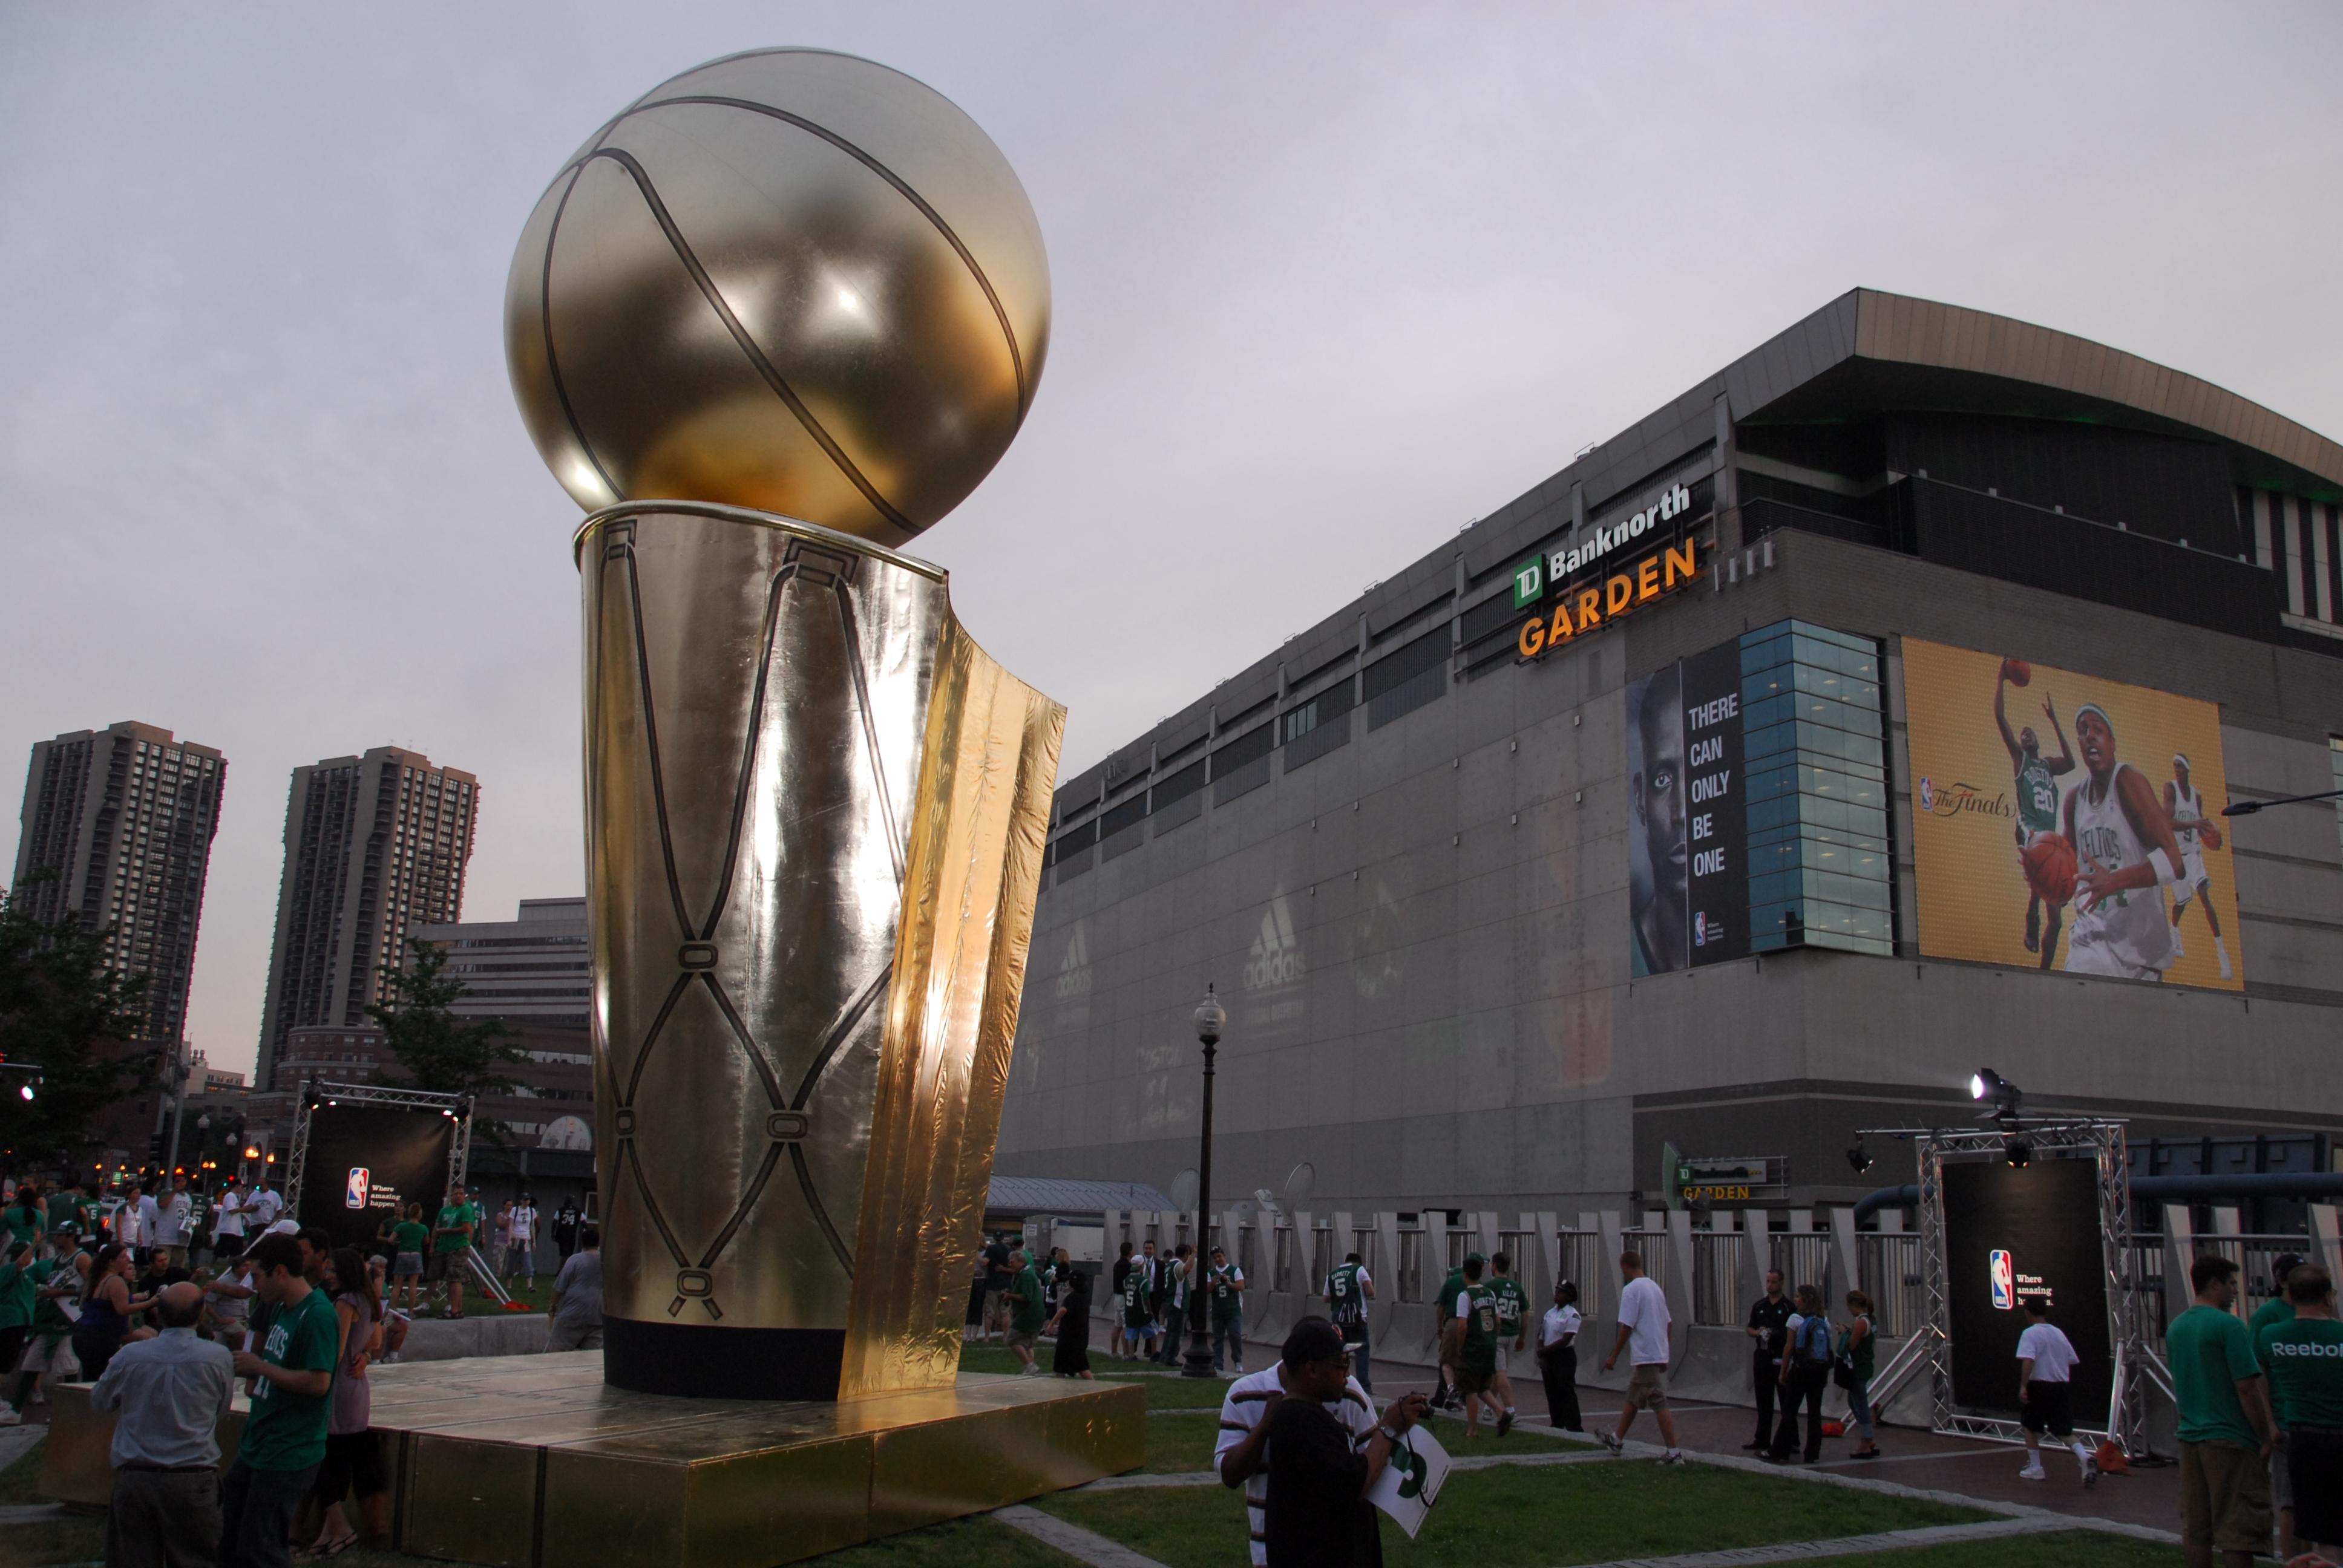 File:TD Garden 2008 Finals.jpg - Wikimedia Commons